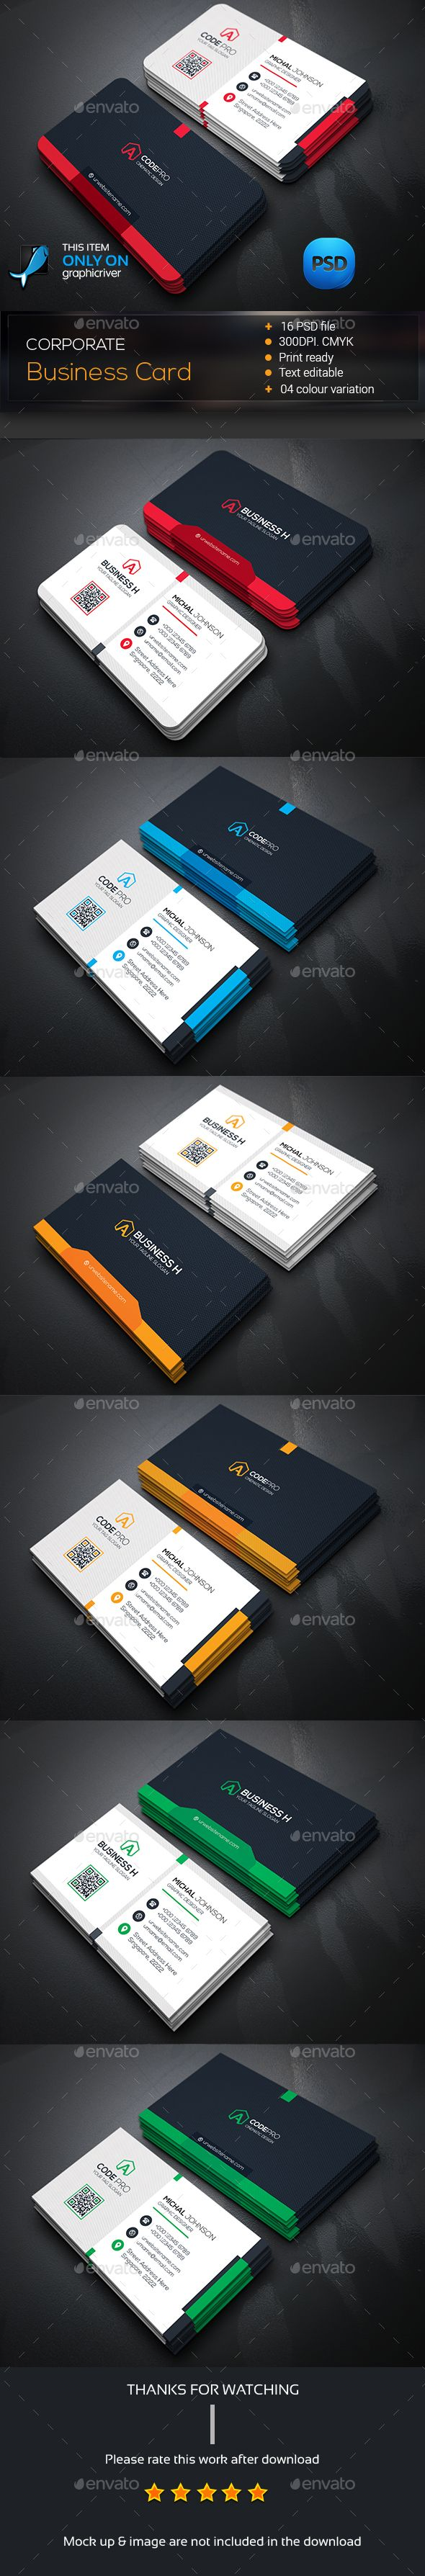 Corporate Business Card Template Bundle PSD #design Download: http://graphicriver.net/item/corporate-business-card-bundle/14429020?ref=ksioks